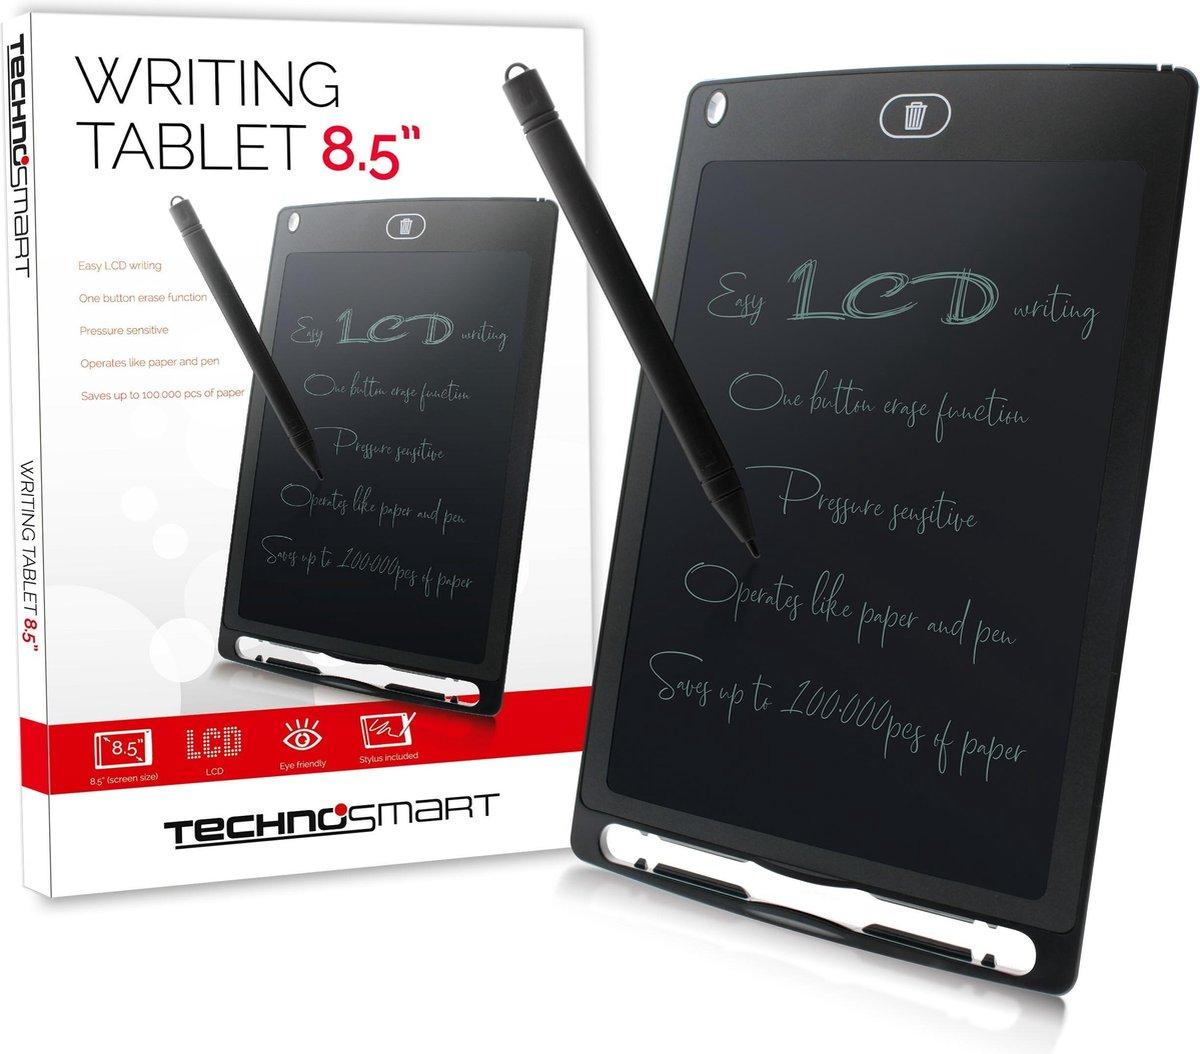 Technosmart Schrijftablet Kids / 10 inch Tekenbord / LCD Teken Tablet / LCD Schrijf Tablet - zwart